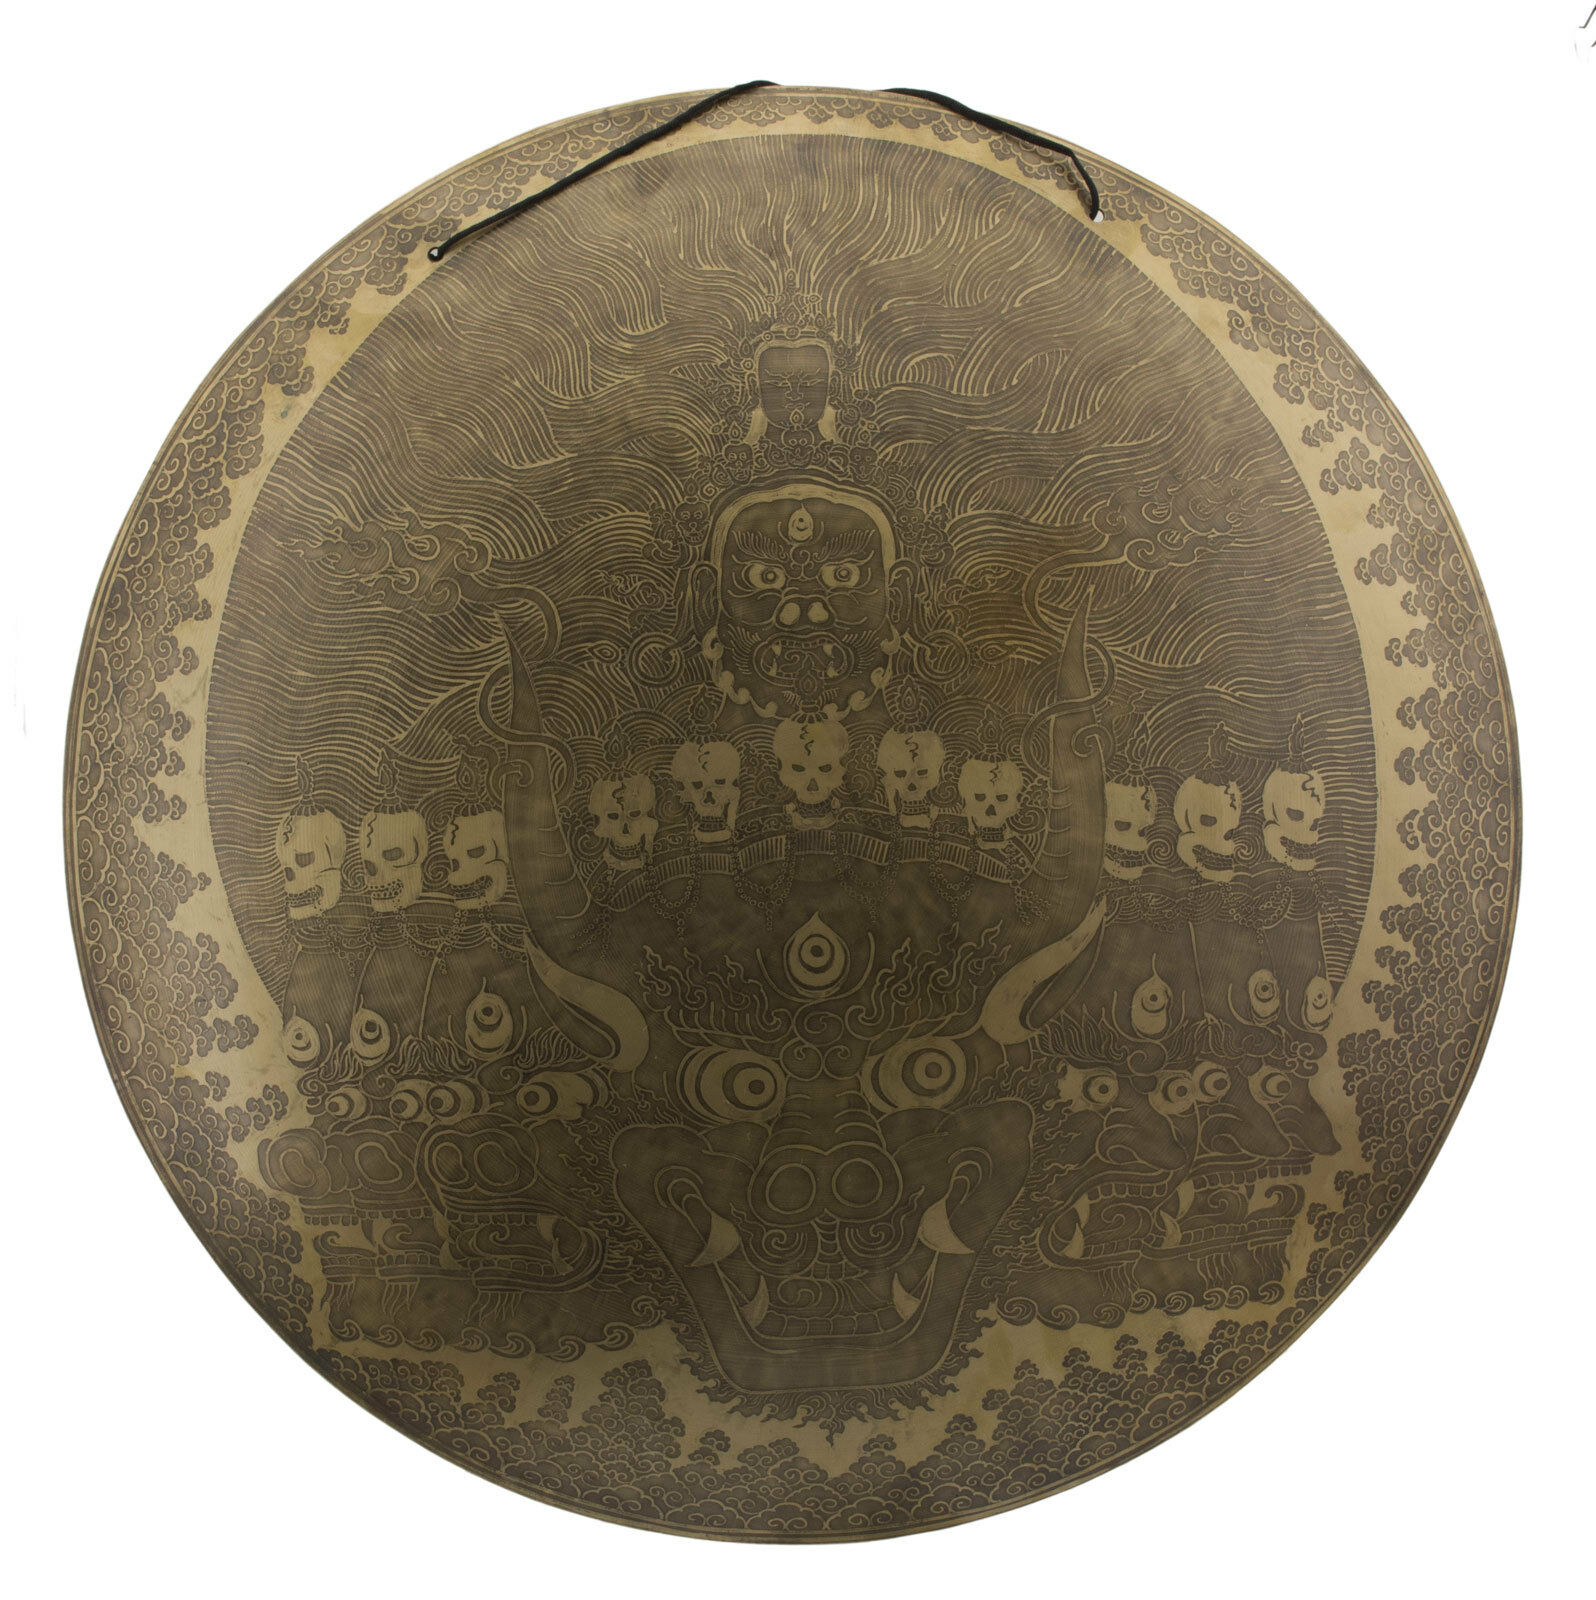 Gong TIBET- Yamantaka 7 Metall o 67 cm 5kg300 TIBET Nepal 25779 hg 3